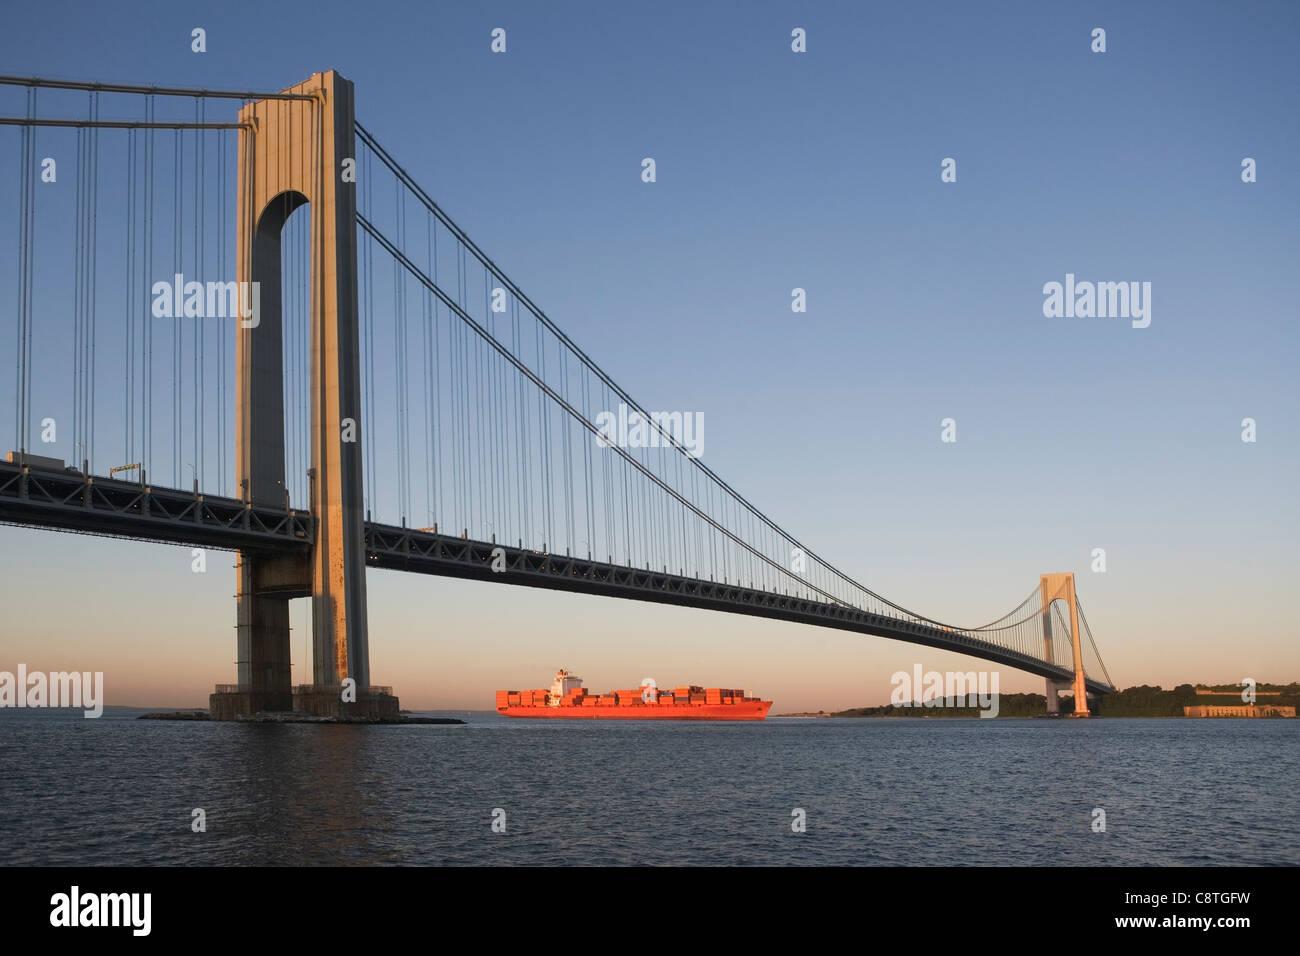 USA, Staat New York, New York City, Brooklyn, Containerschiff unter Verrazano-Narrows-Brücke Stockbild